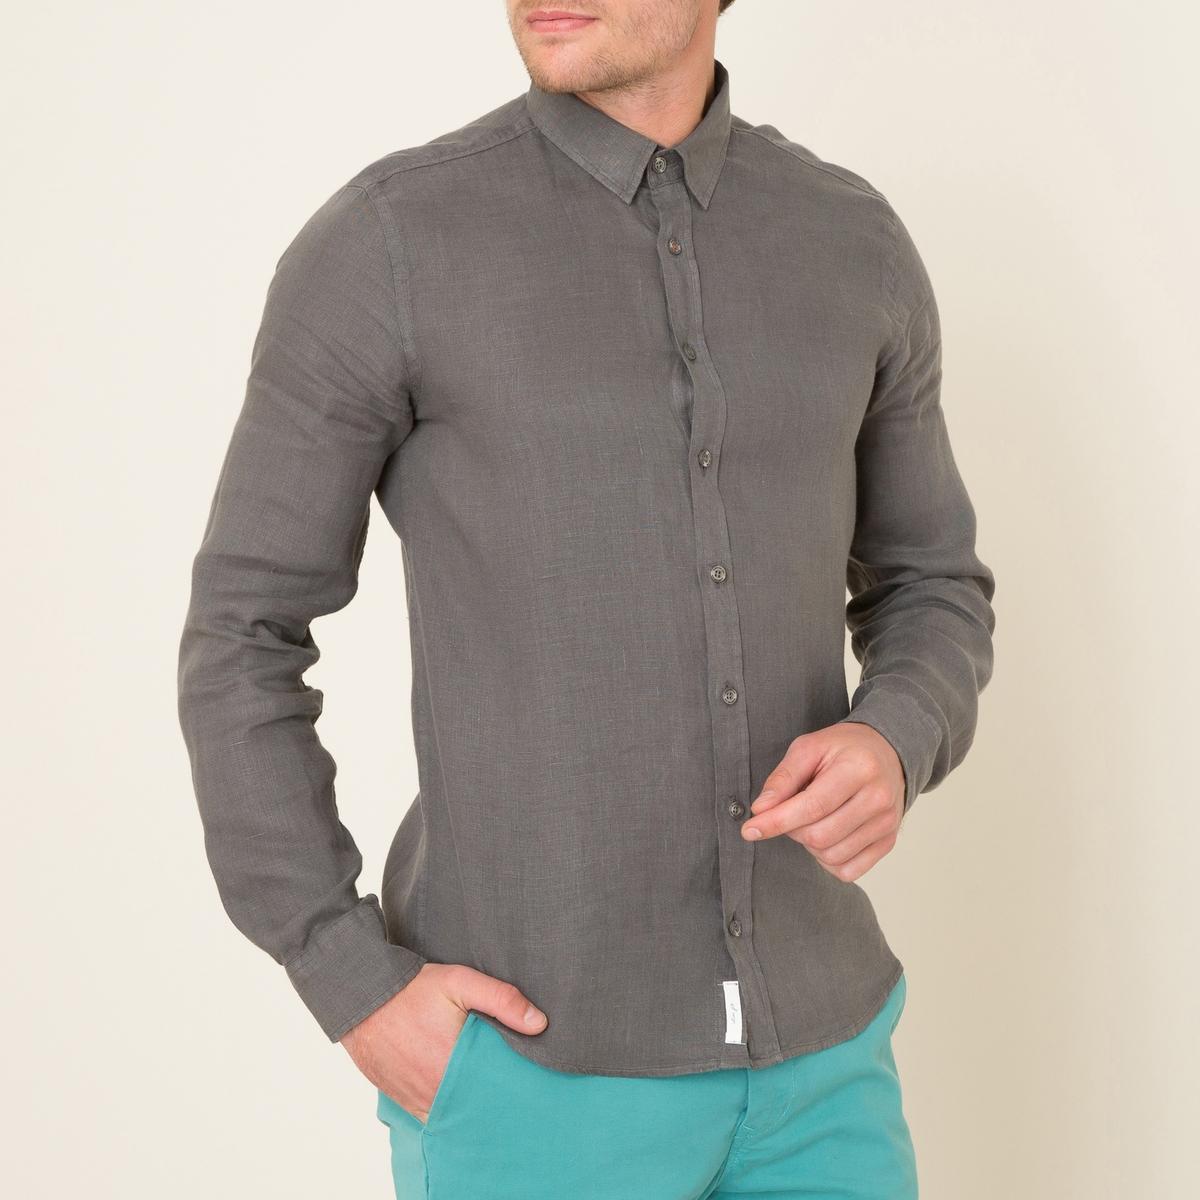 Рубашка льняная FORBANСостав и описание Материал : 100% ленМарка : HARRIS WILSON<br><br>Цвет: хаки<br>Размер: M